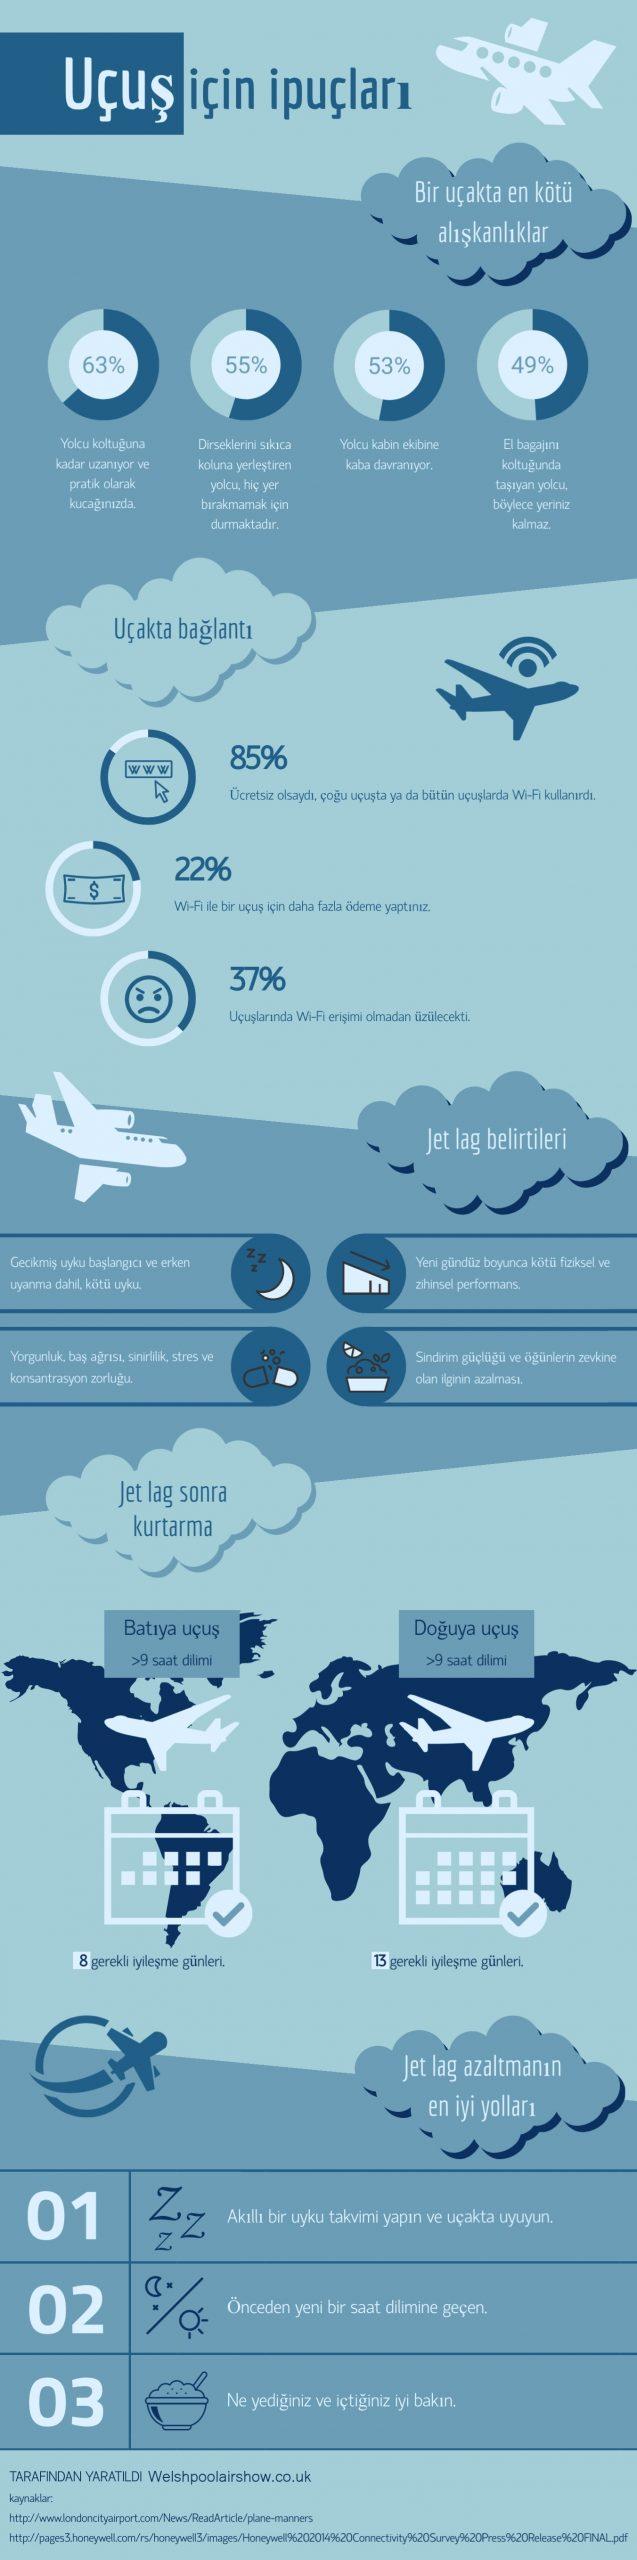 Ucus icin ipuclari infografik